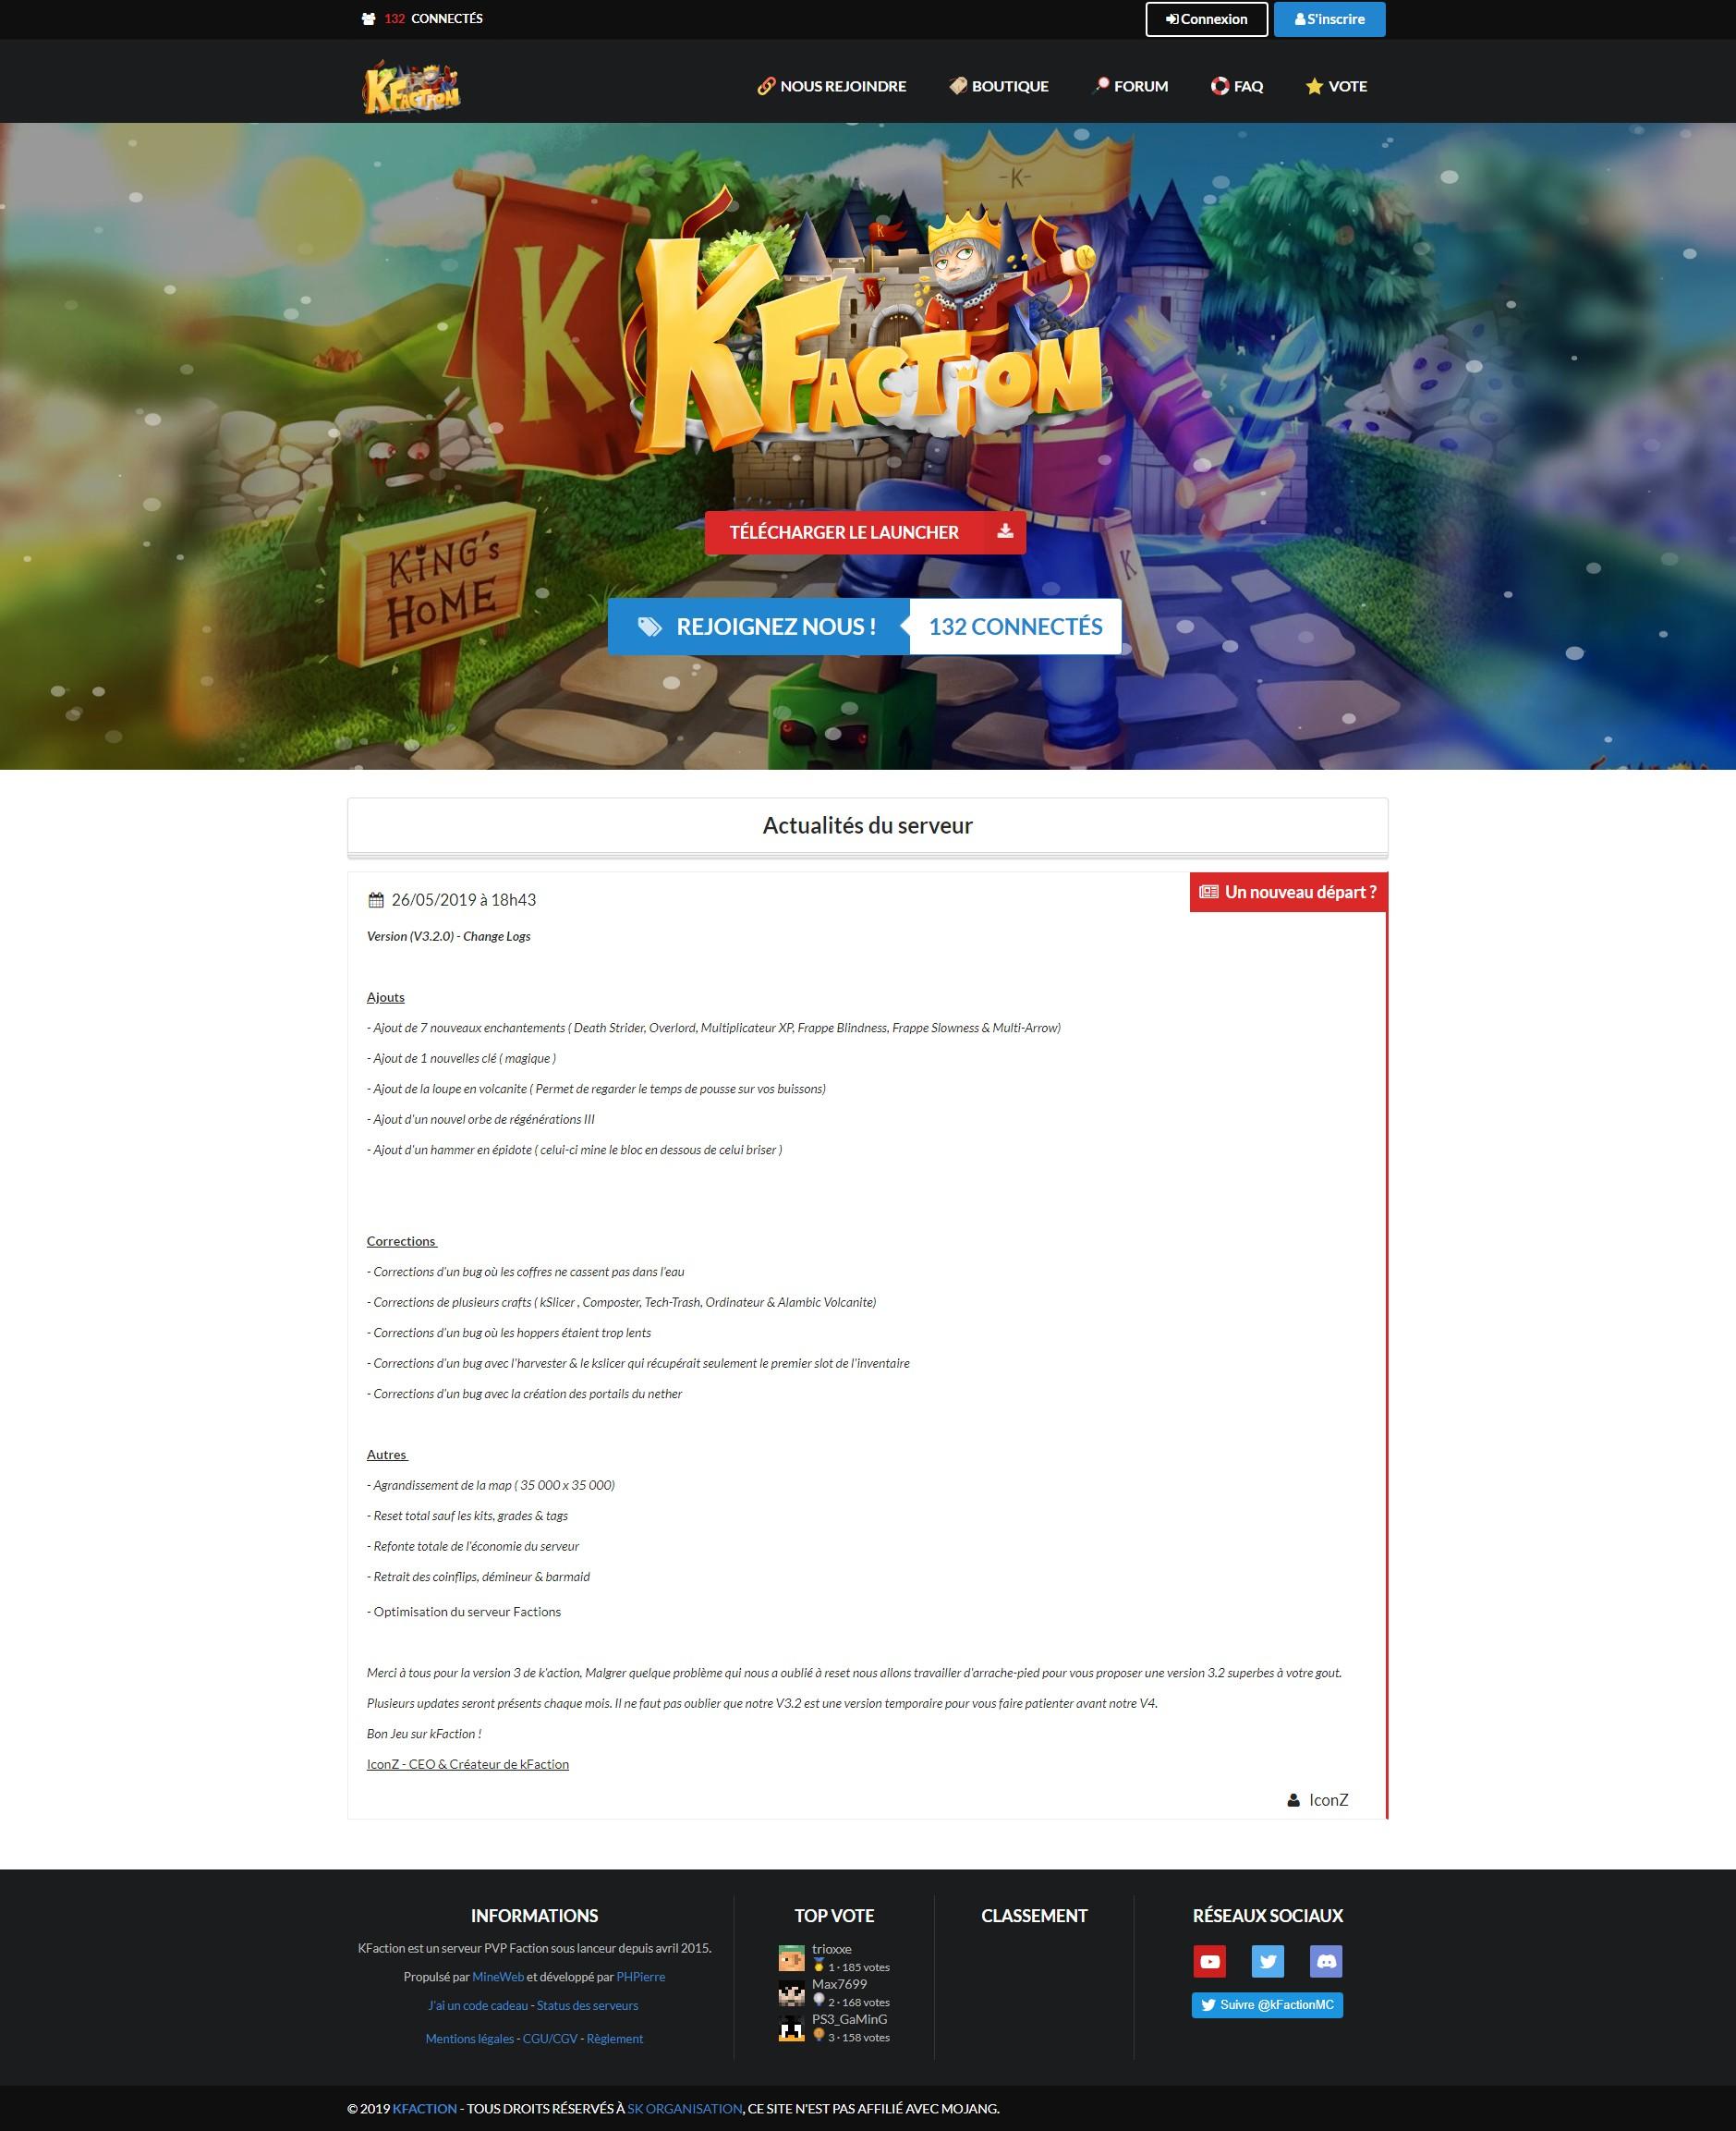 Aperçu du site KFaction